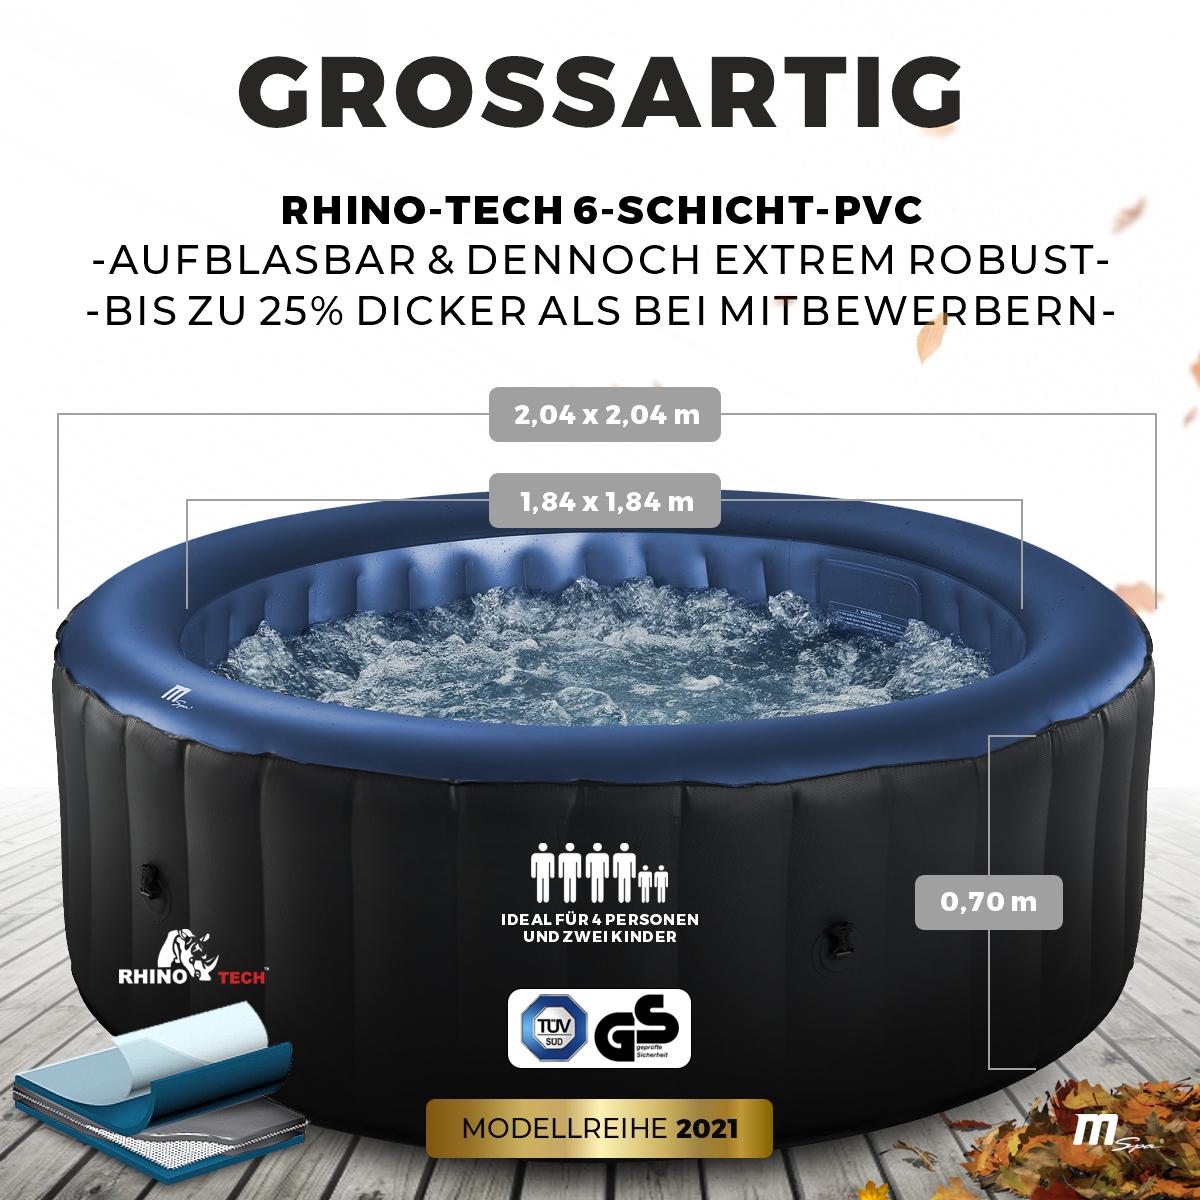 Rhino-Tech PVC Material